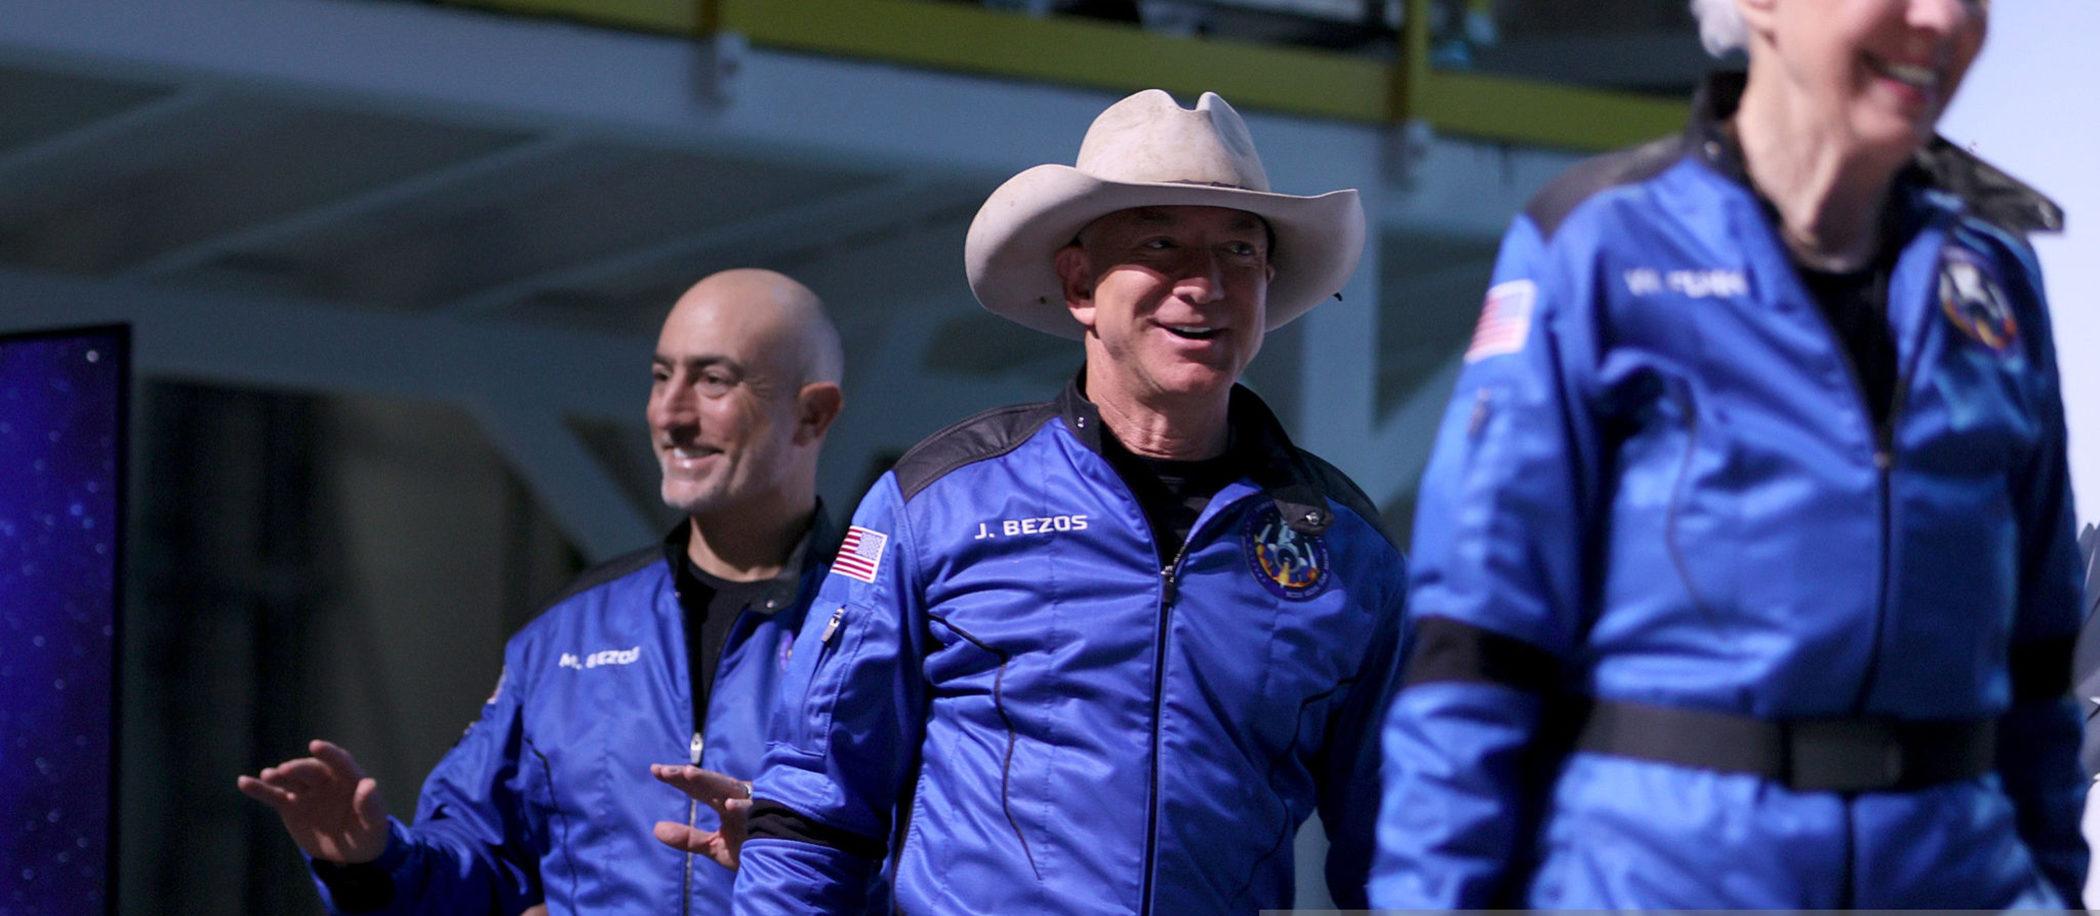 Jeff Bezos, Blue Origin i Omega Speedmaster w kosmosie